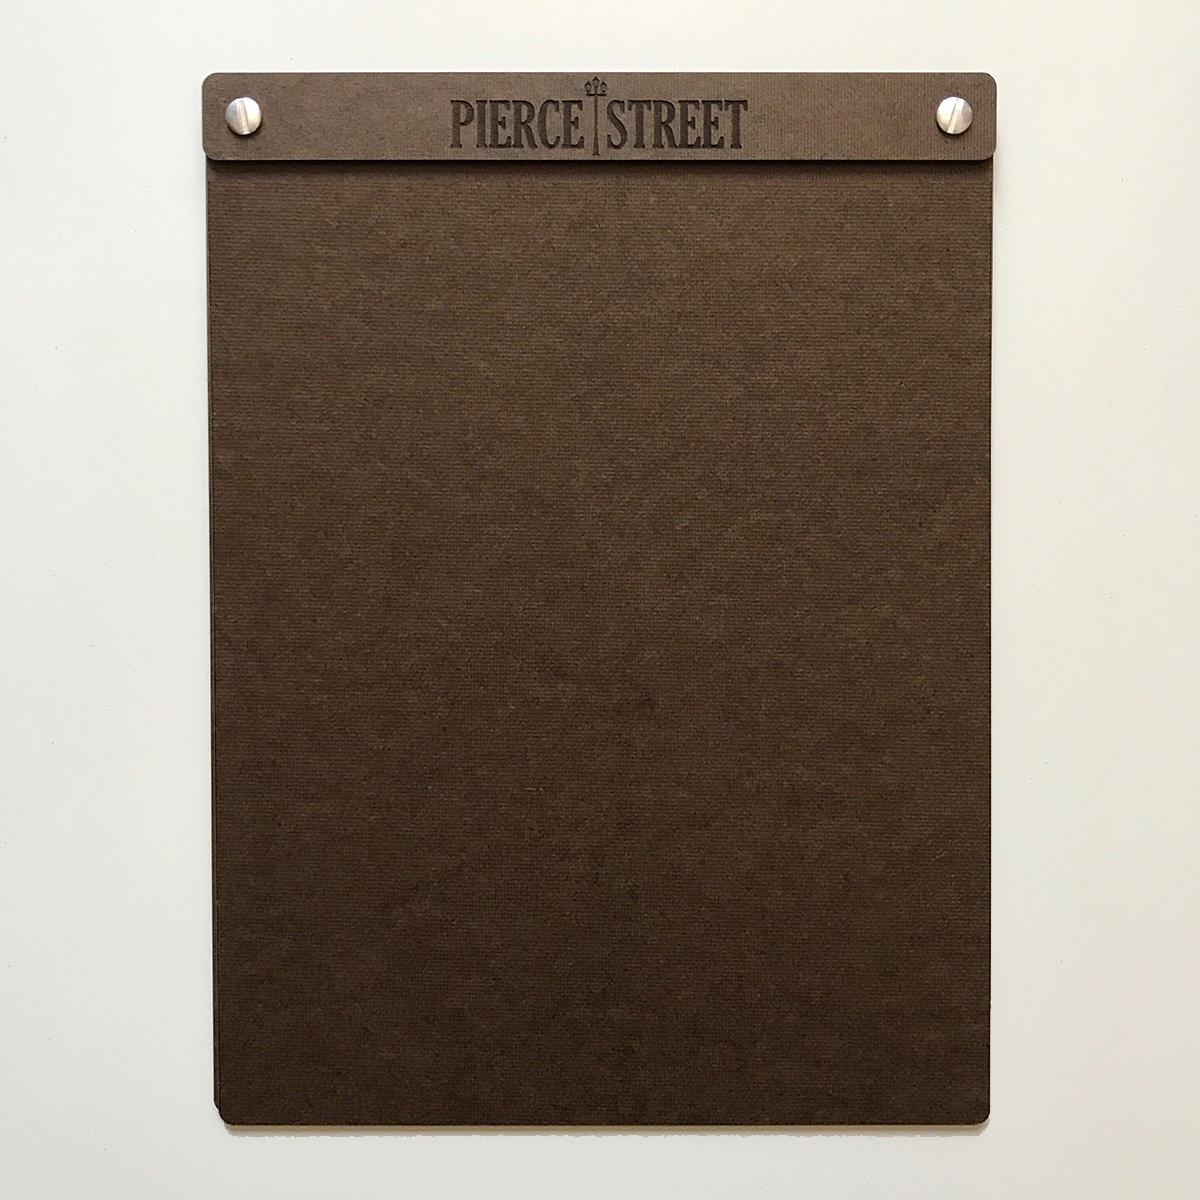 Hardboard Menu Board with Screws